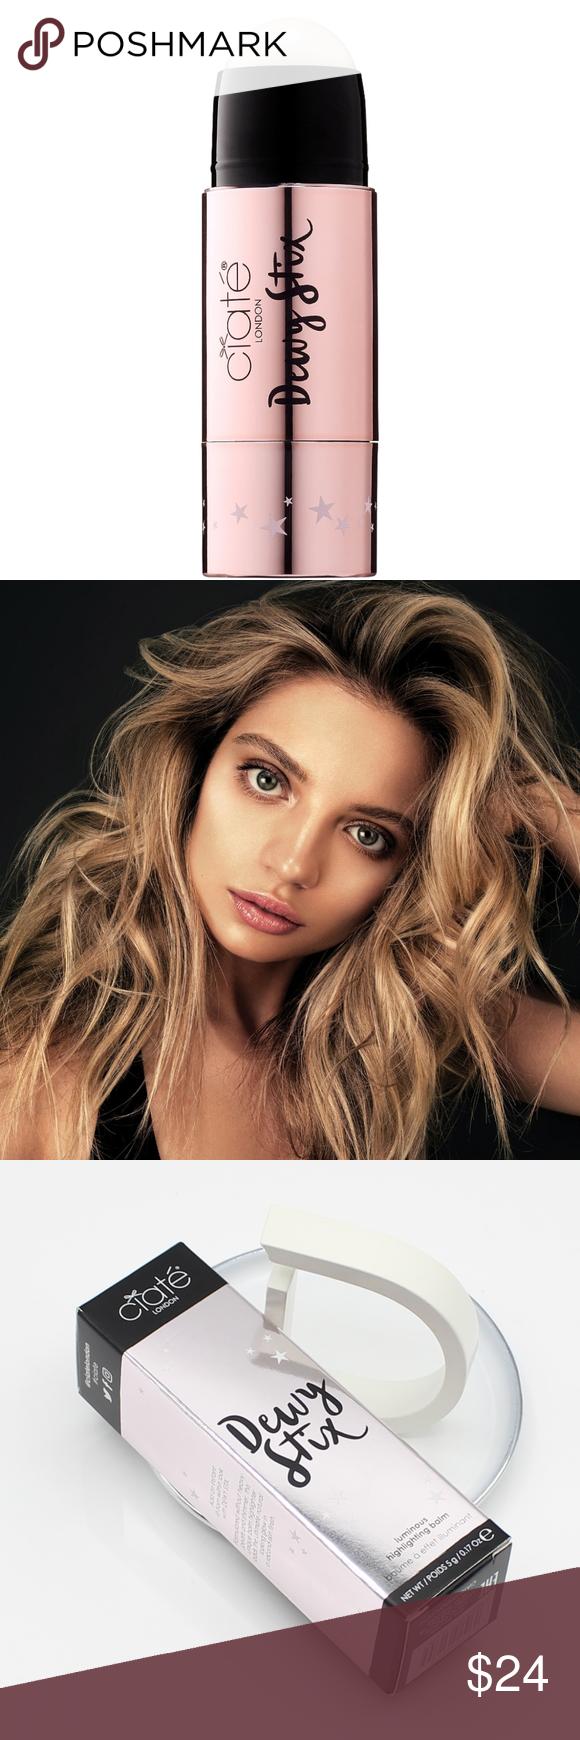 Ciaté Dewy Stix Glow Ciate, The balm, Highlighter makeup